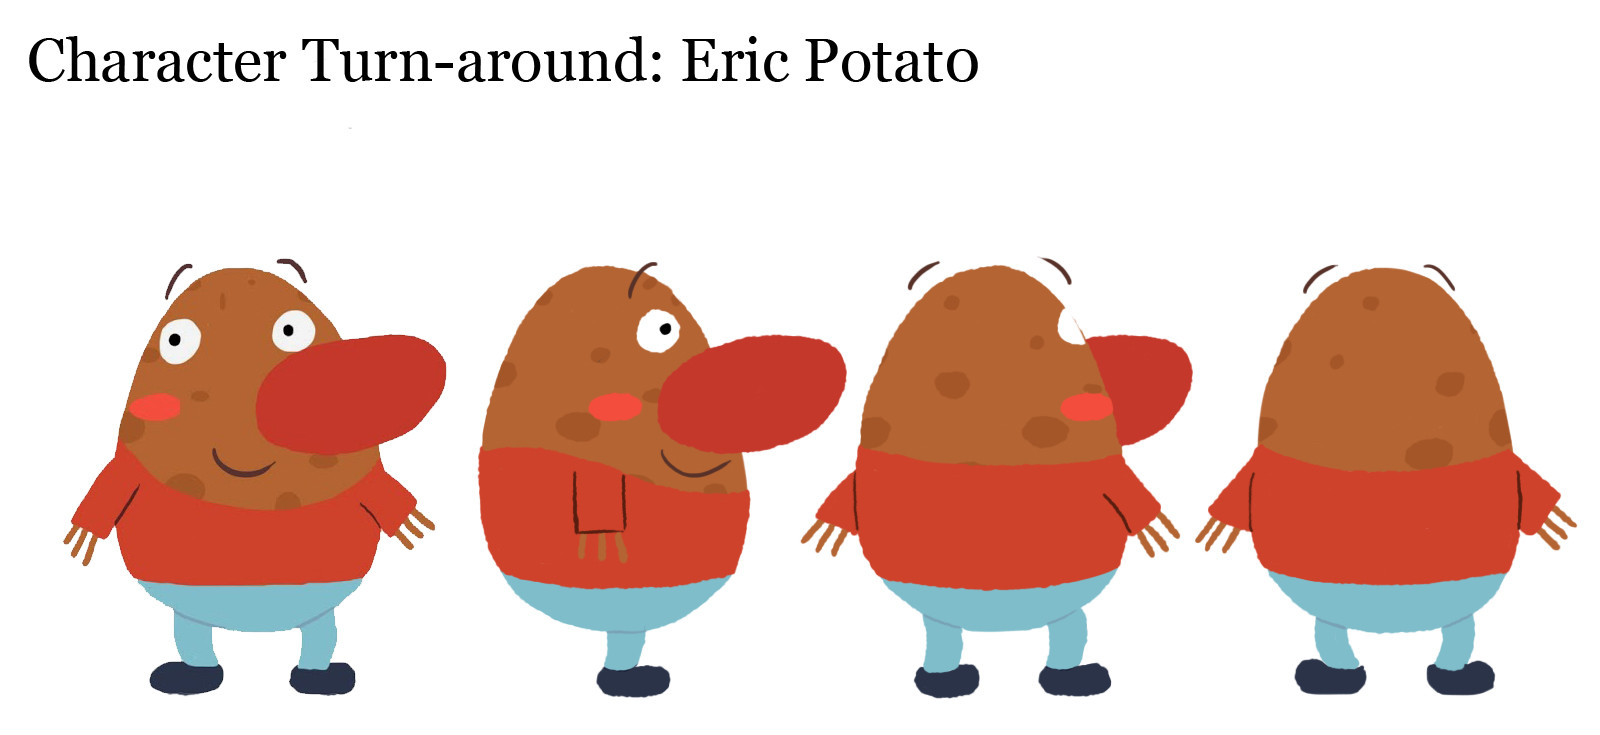 Eric The Potato